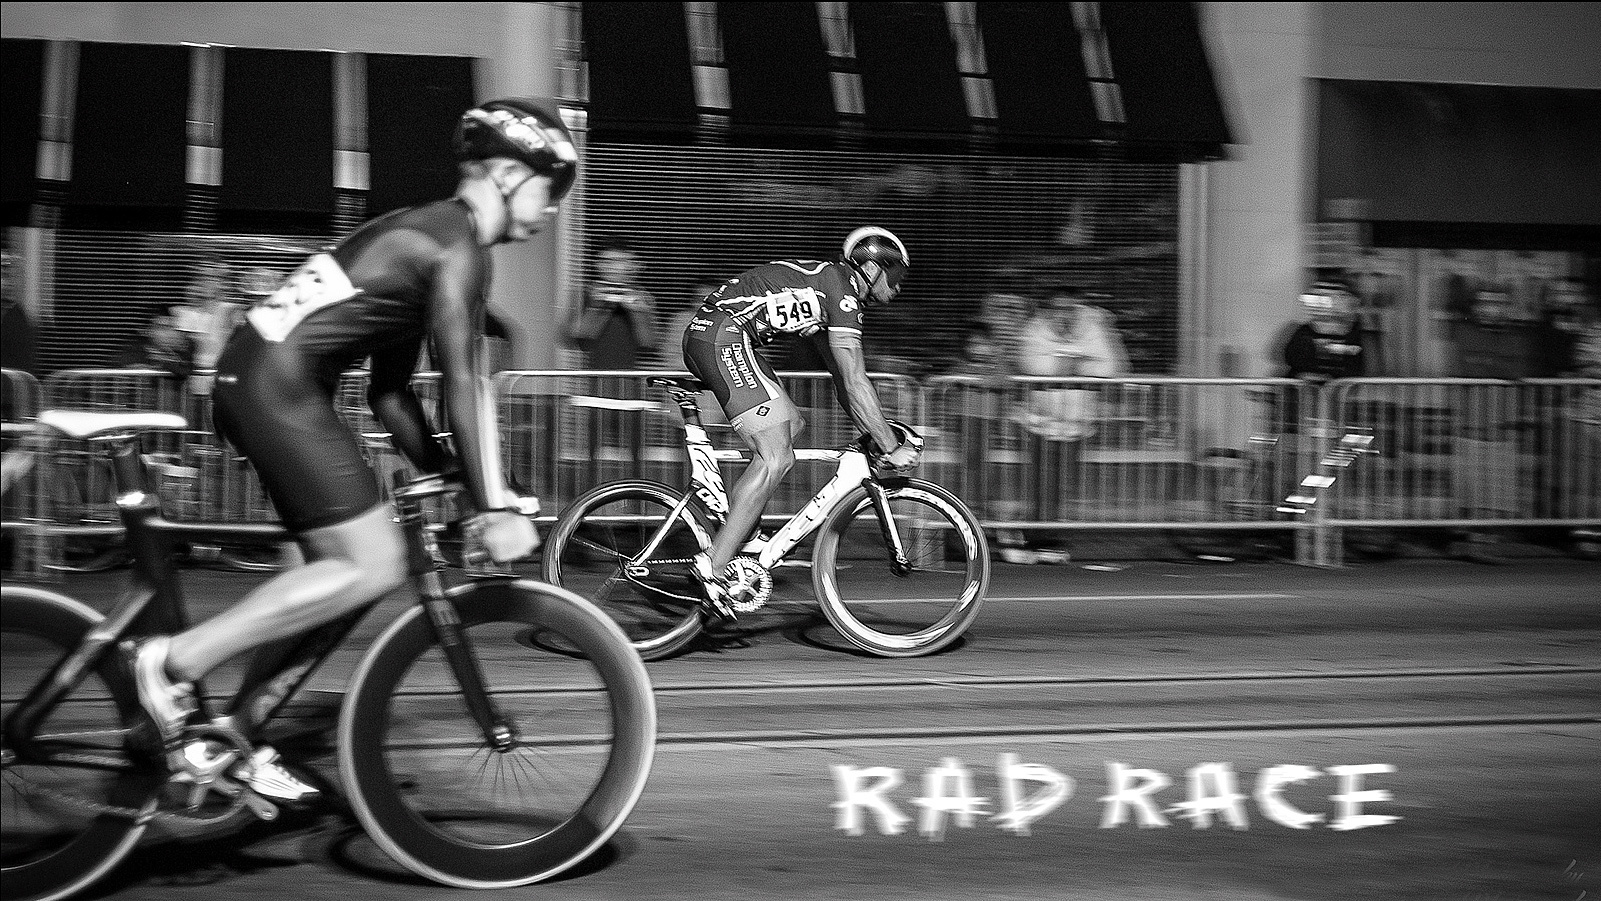 RAD-RACE-Los-gehts.jpg